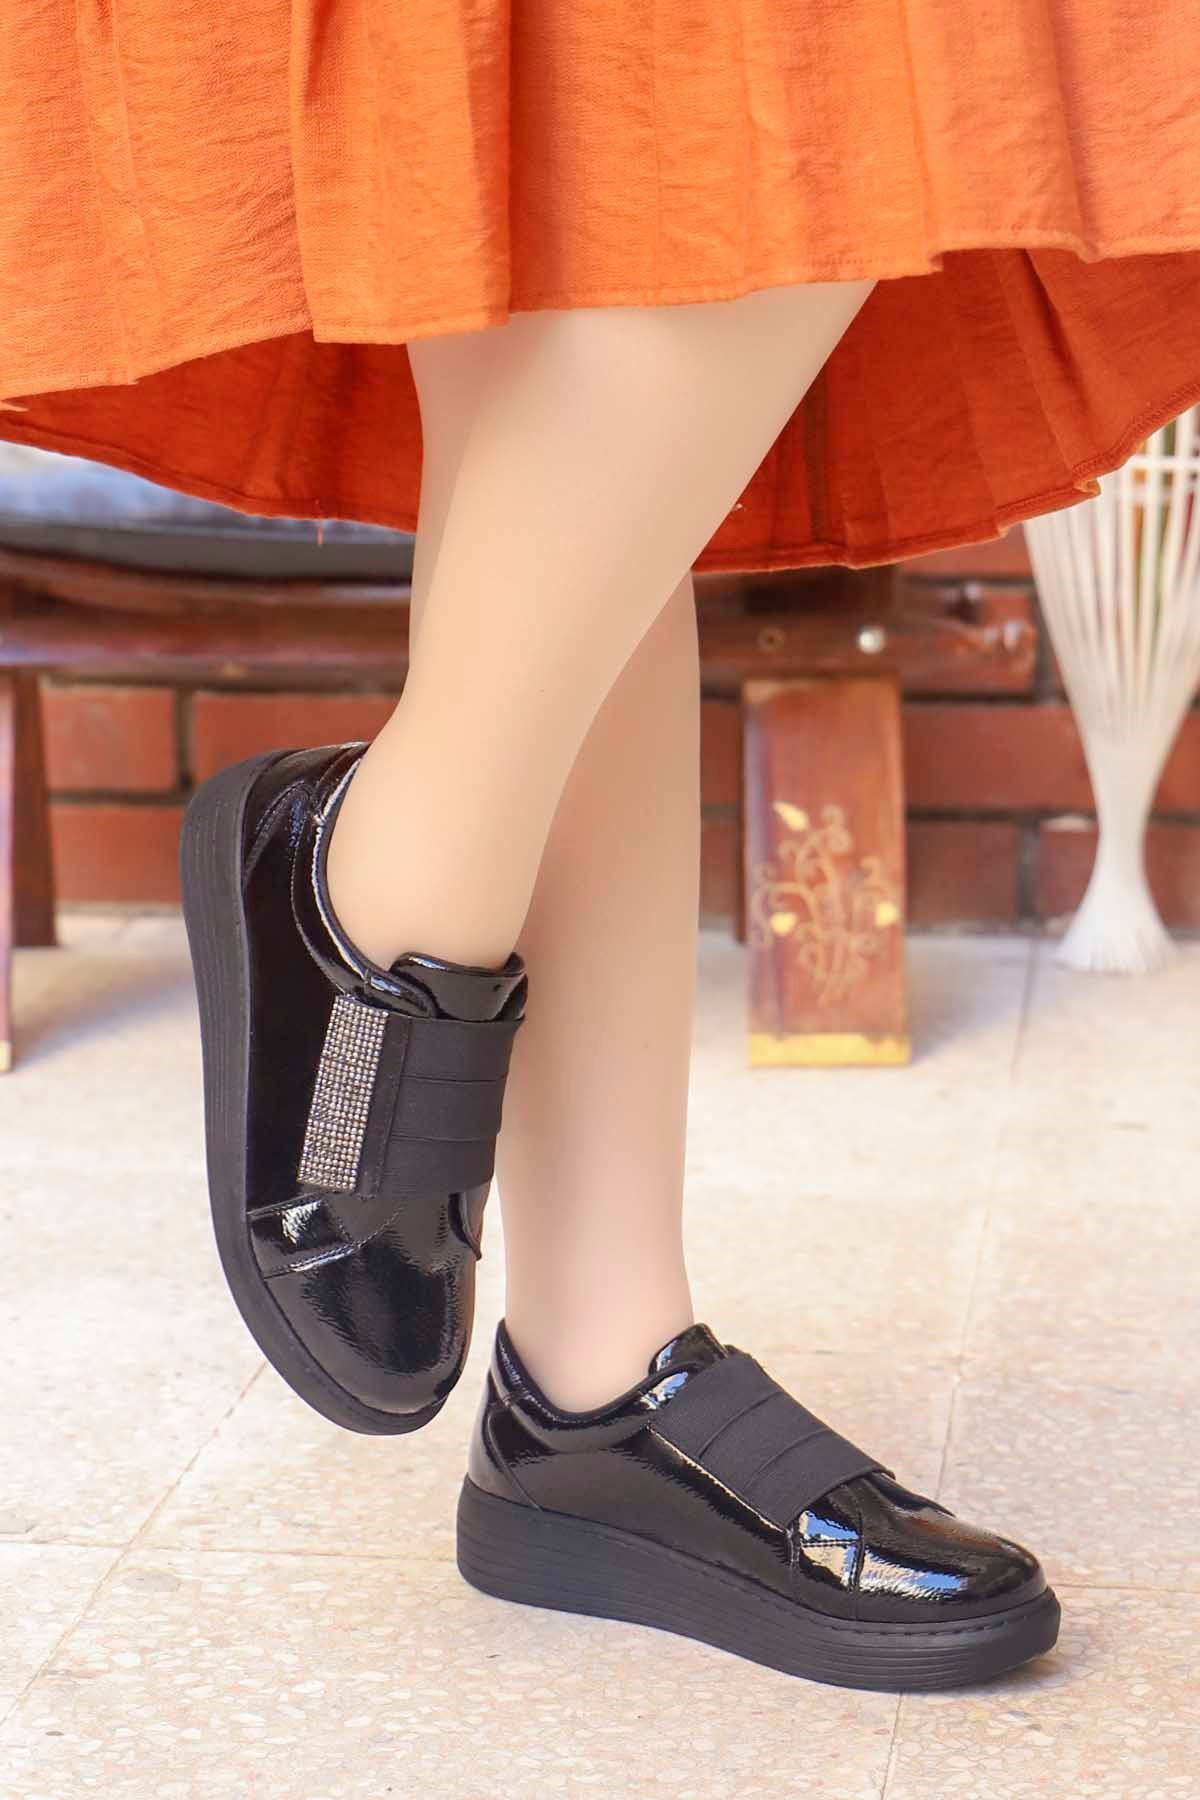 mami-066 Lastik Taş Detay Spor Ayakkabı Siyah Rugan